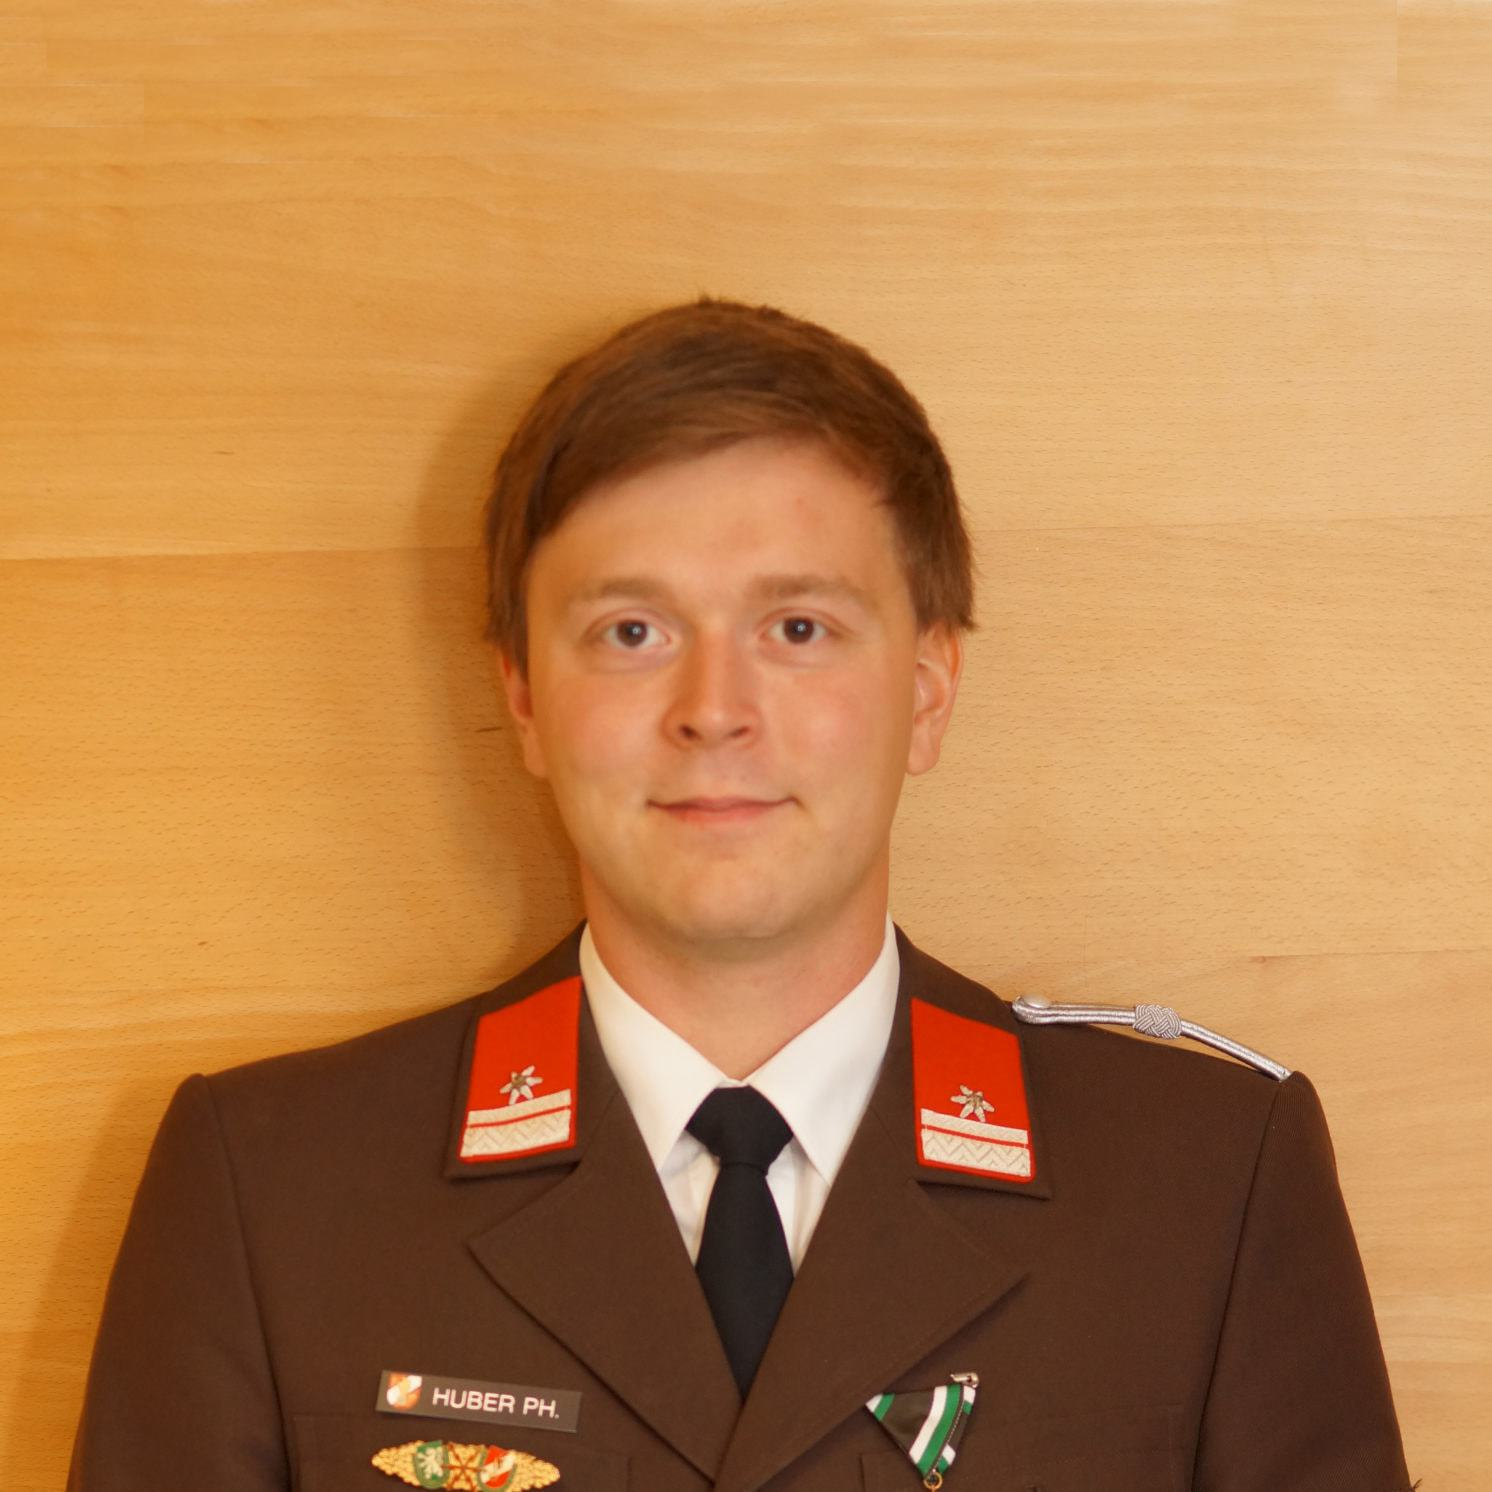 BM Huber Philipp